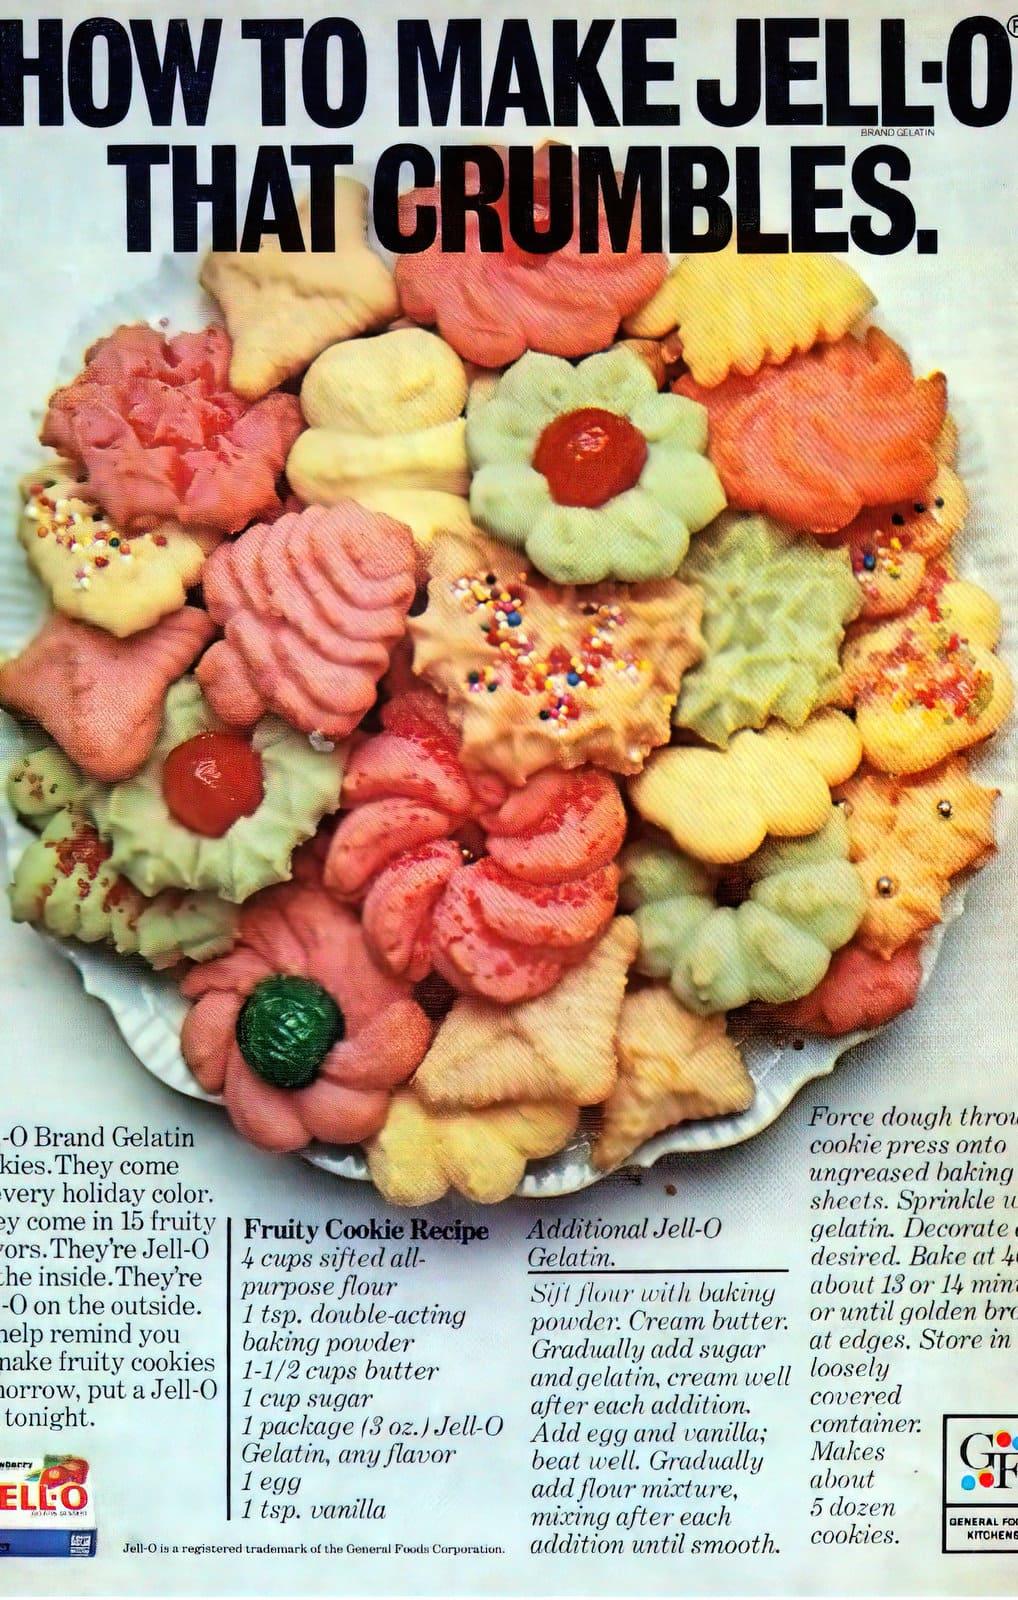 Jell-O fruity cookie recipe